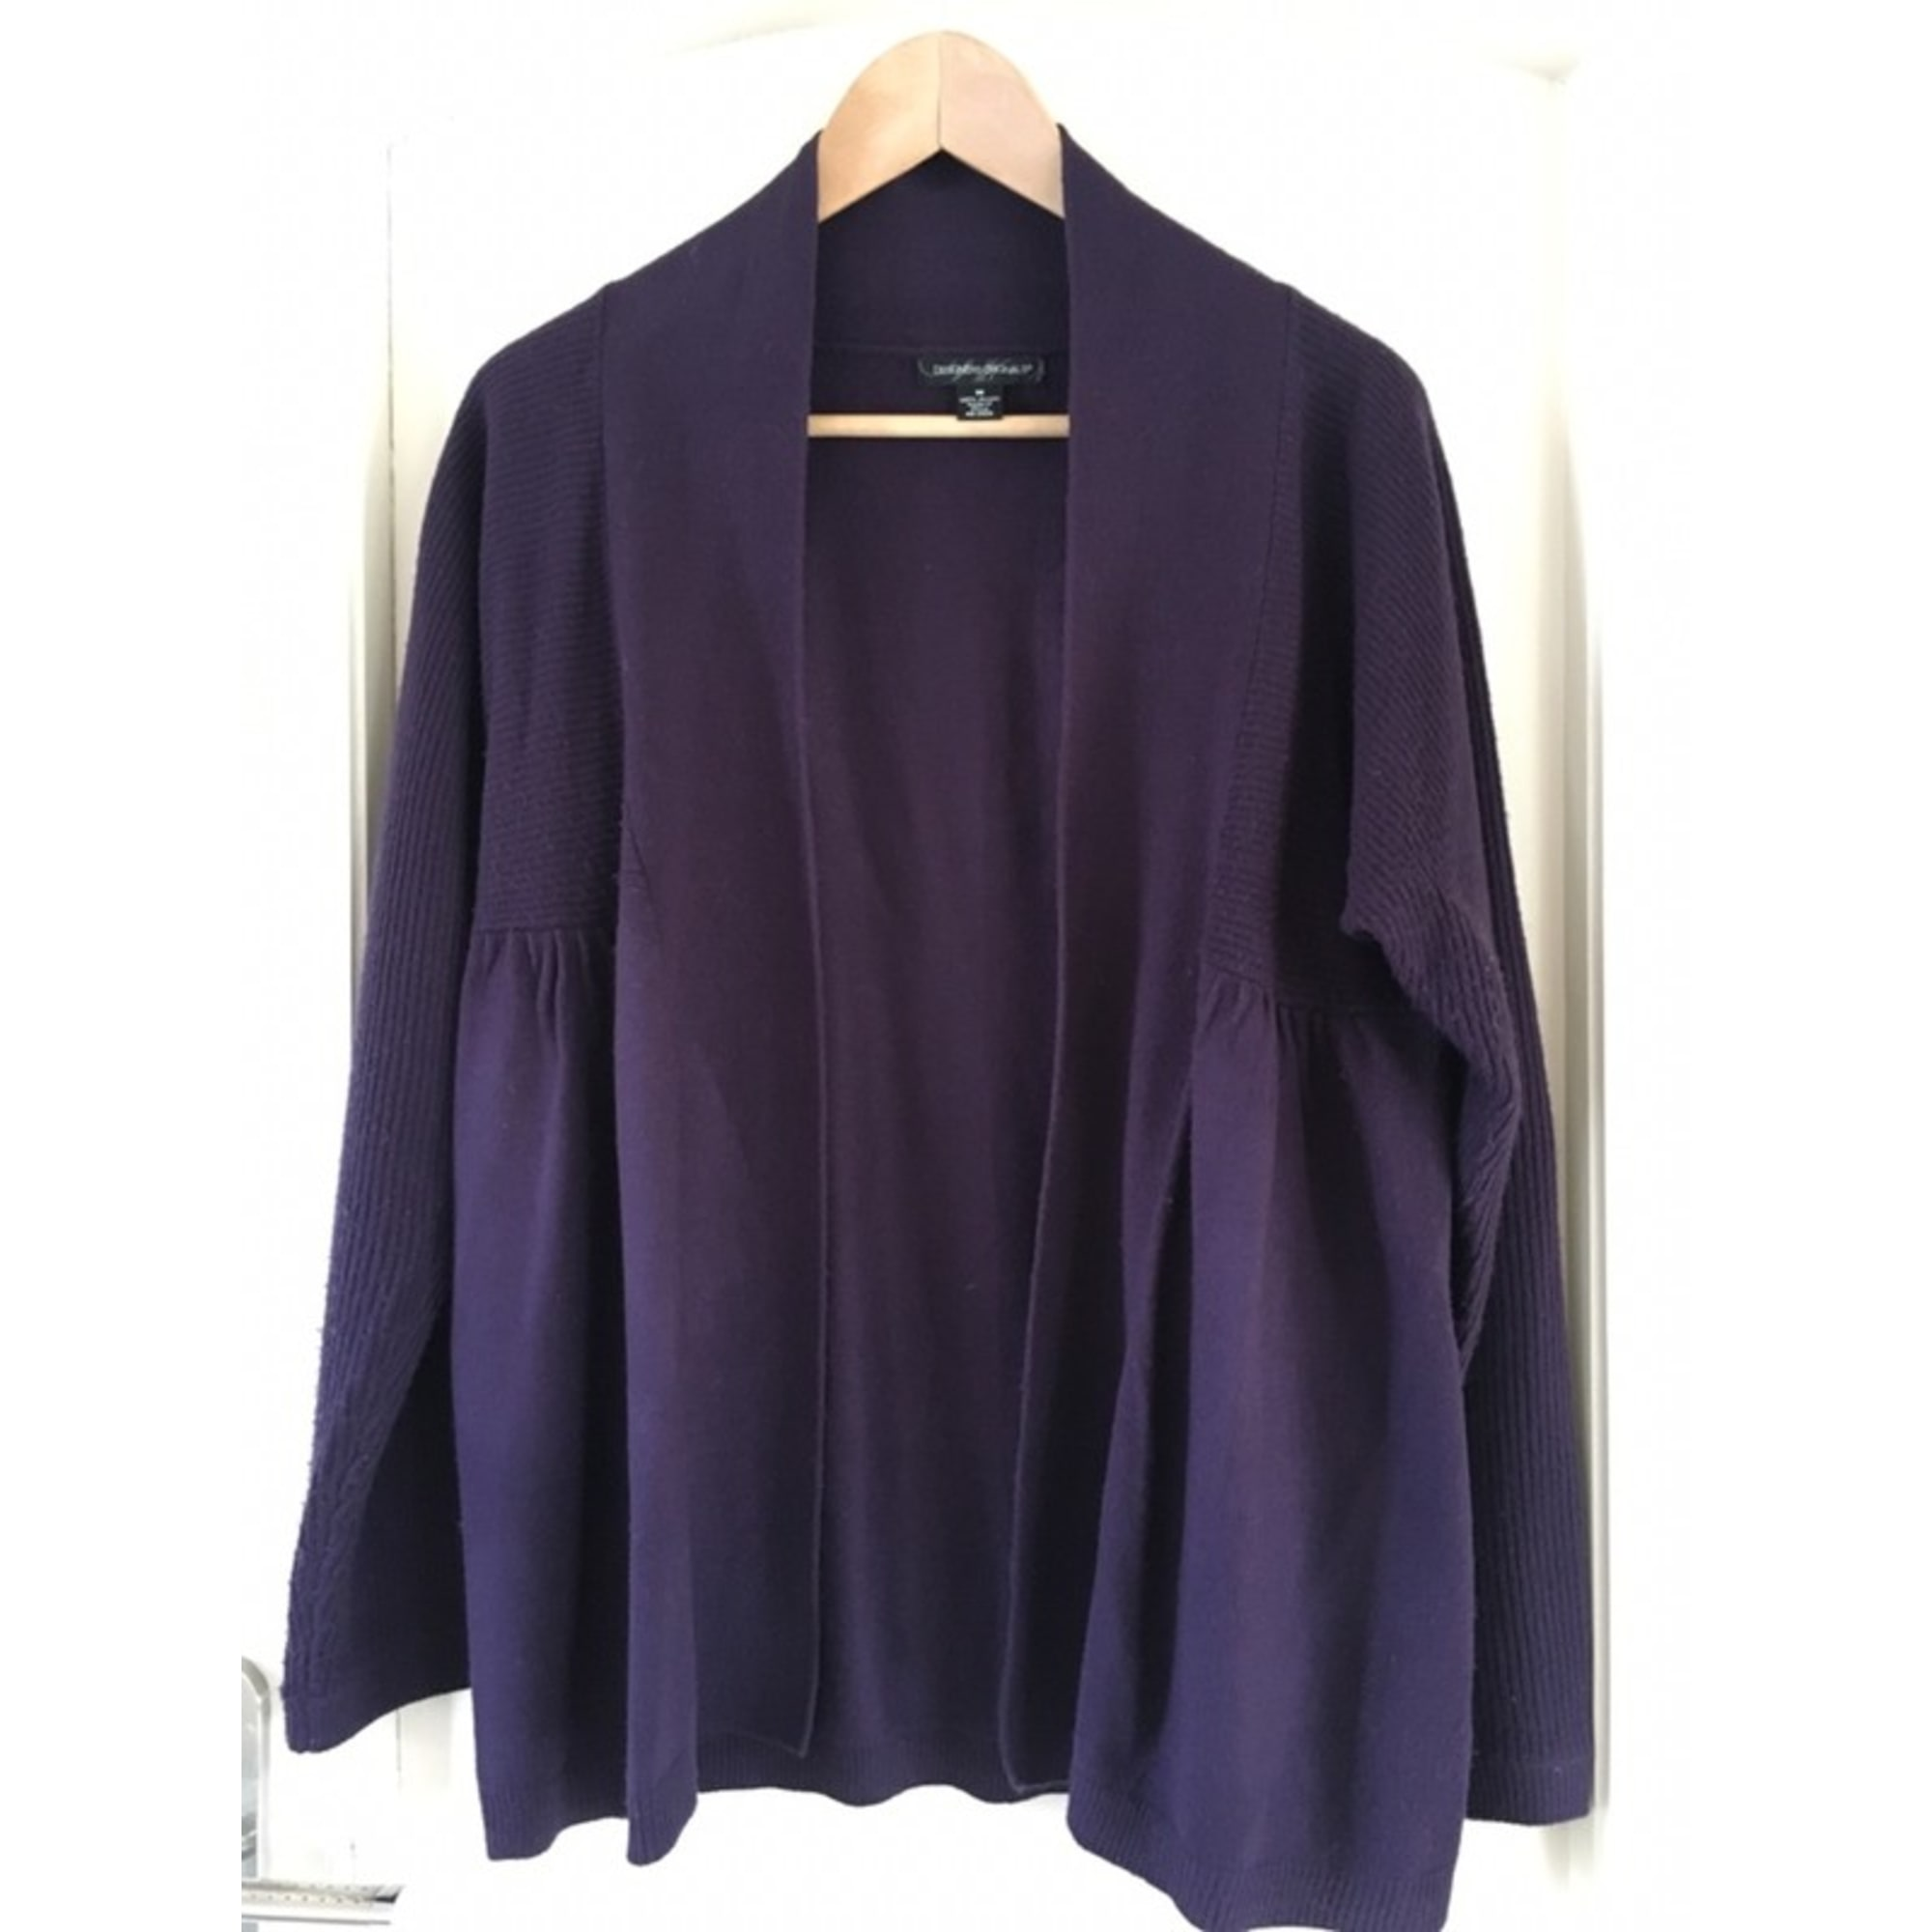 Gilet, cardigan DESIGNERS ORIGINALS Violet, mauve, lavande